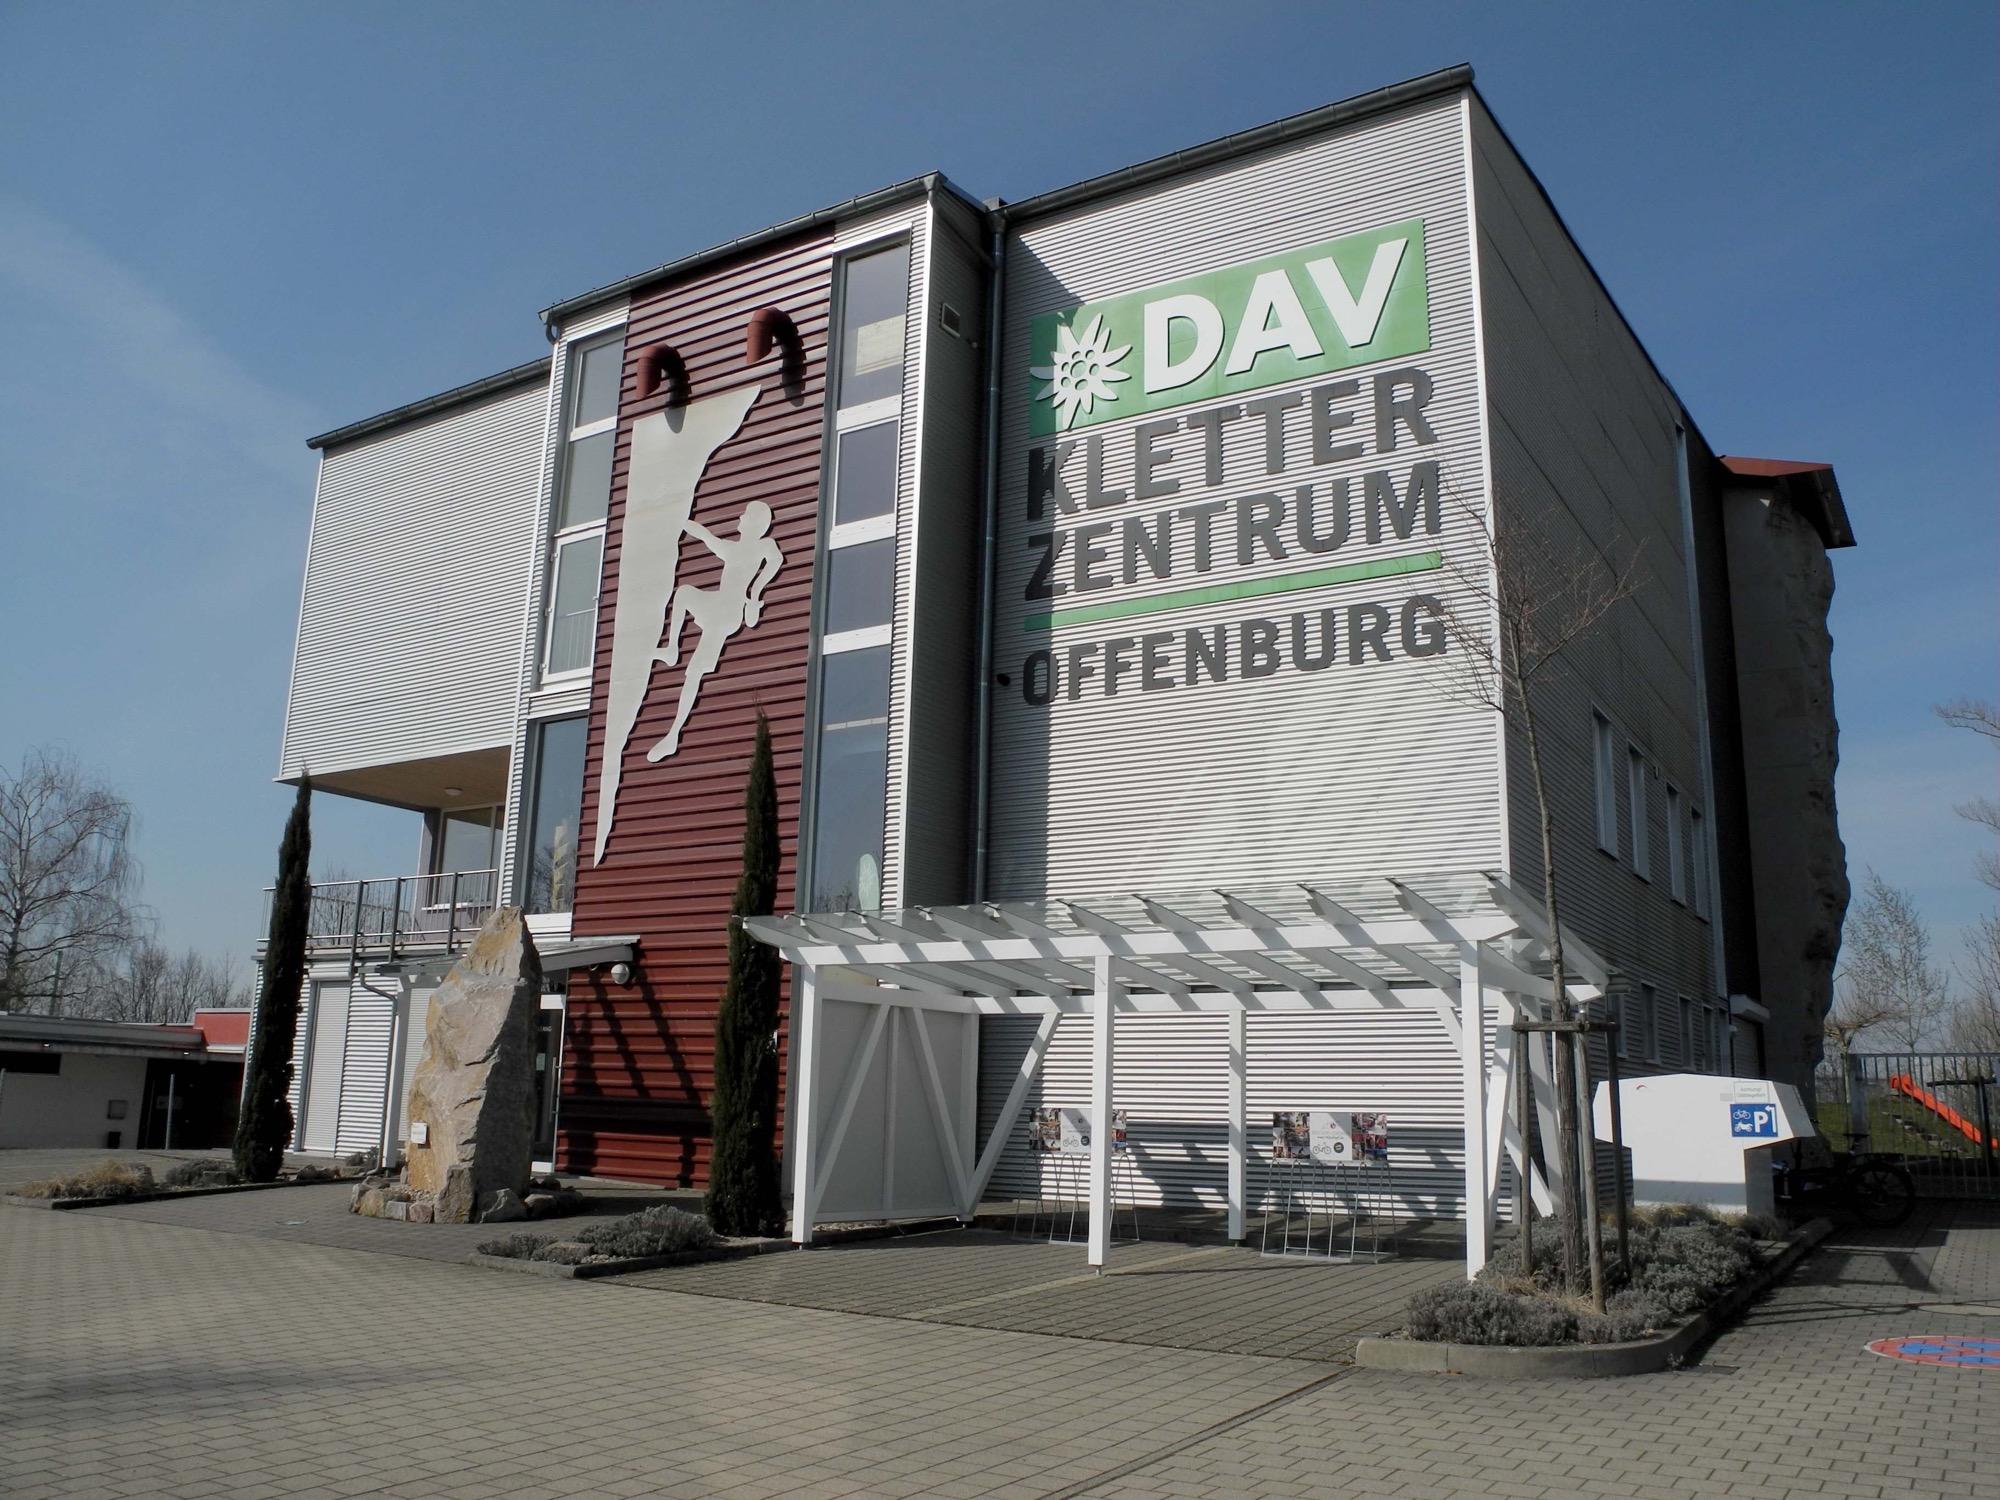 2021-6-4-OG-DAV-Öffnung Kletterzentrum_Offenburg_Ansicht